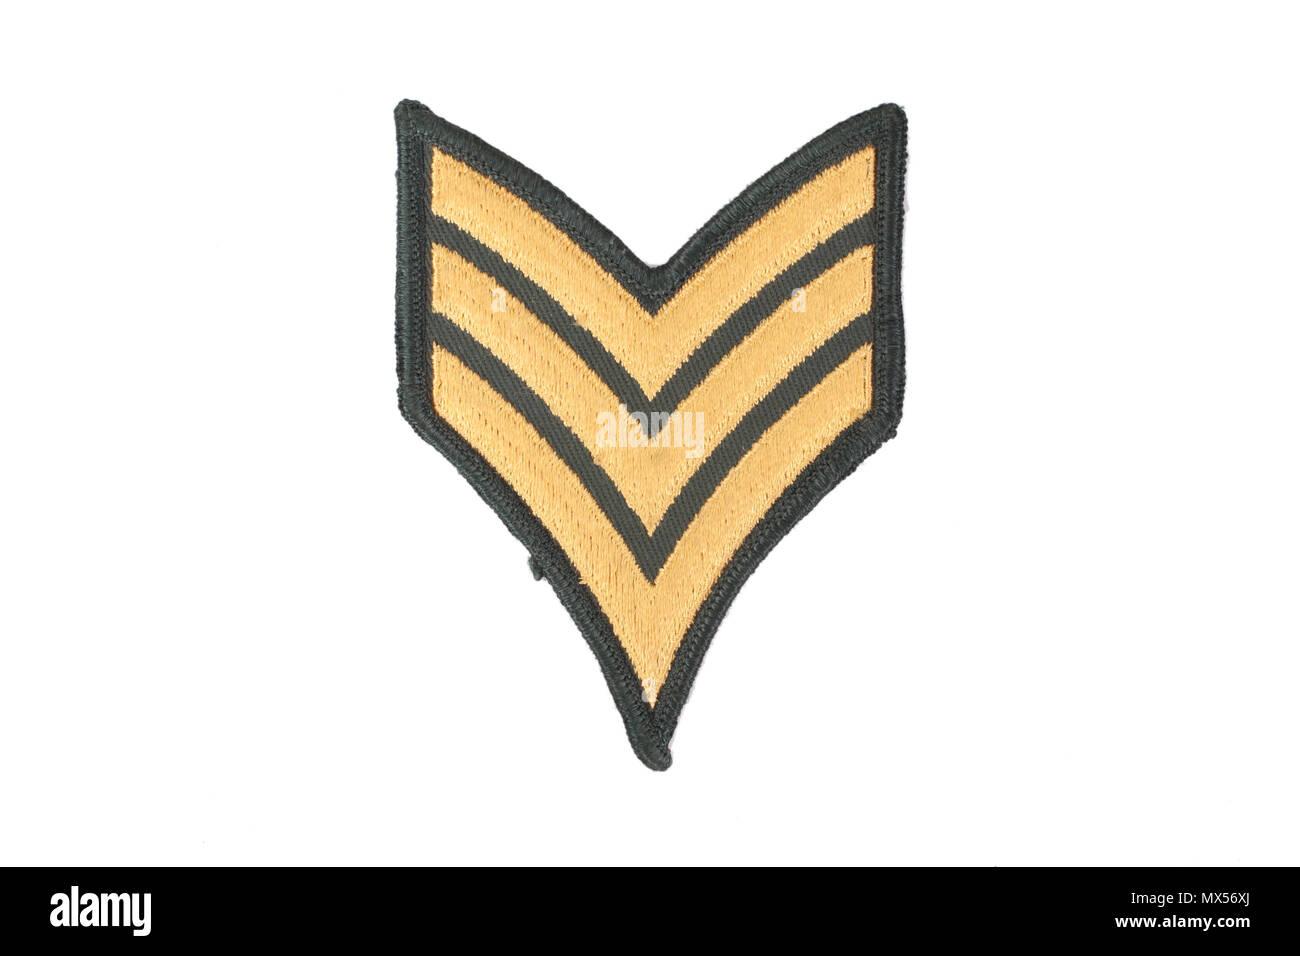 Dress Uniform Marines Stock Photos & Dress Uniform Marines Stock